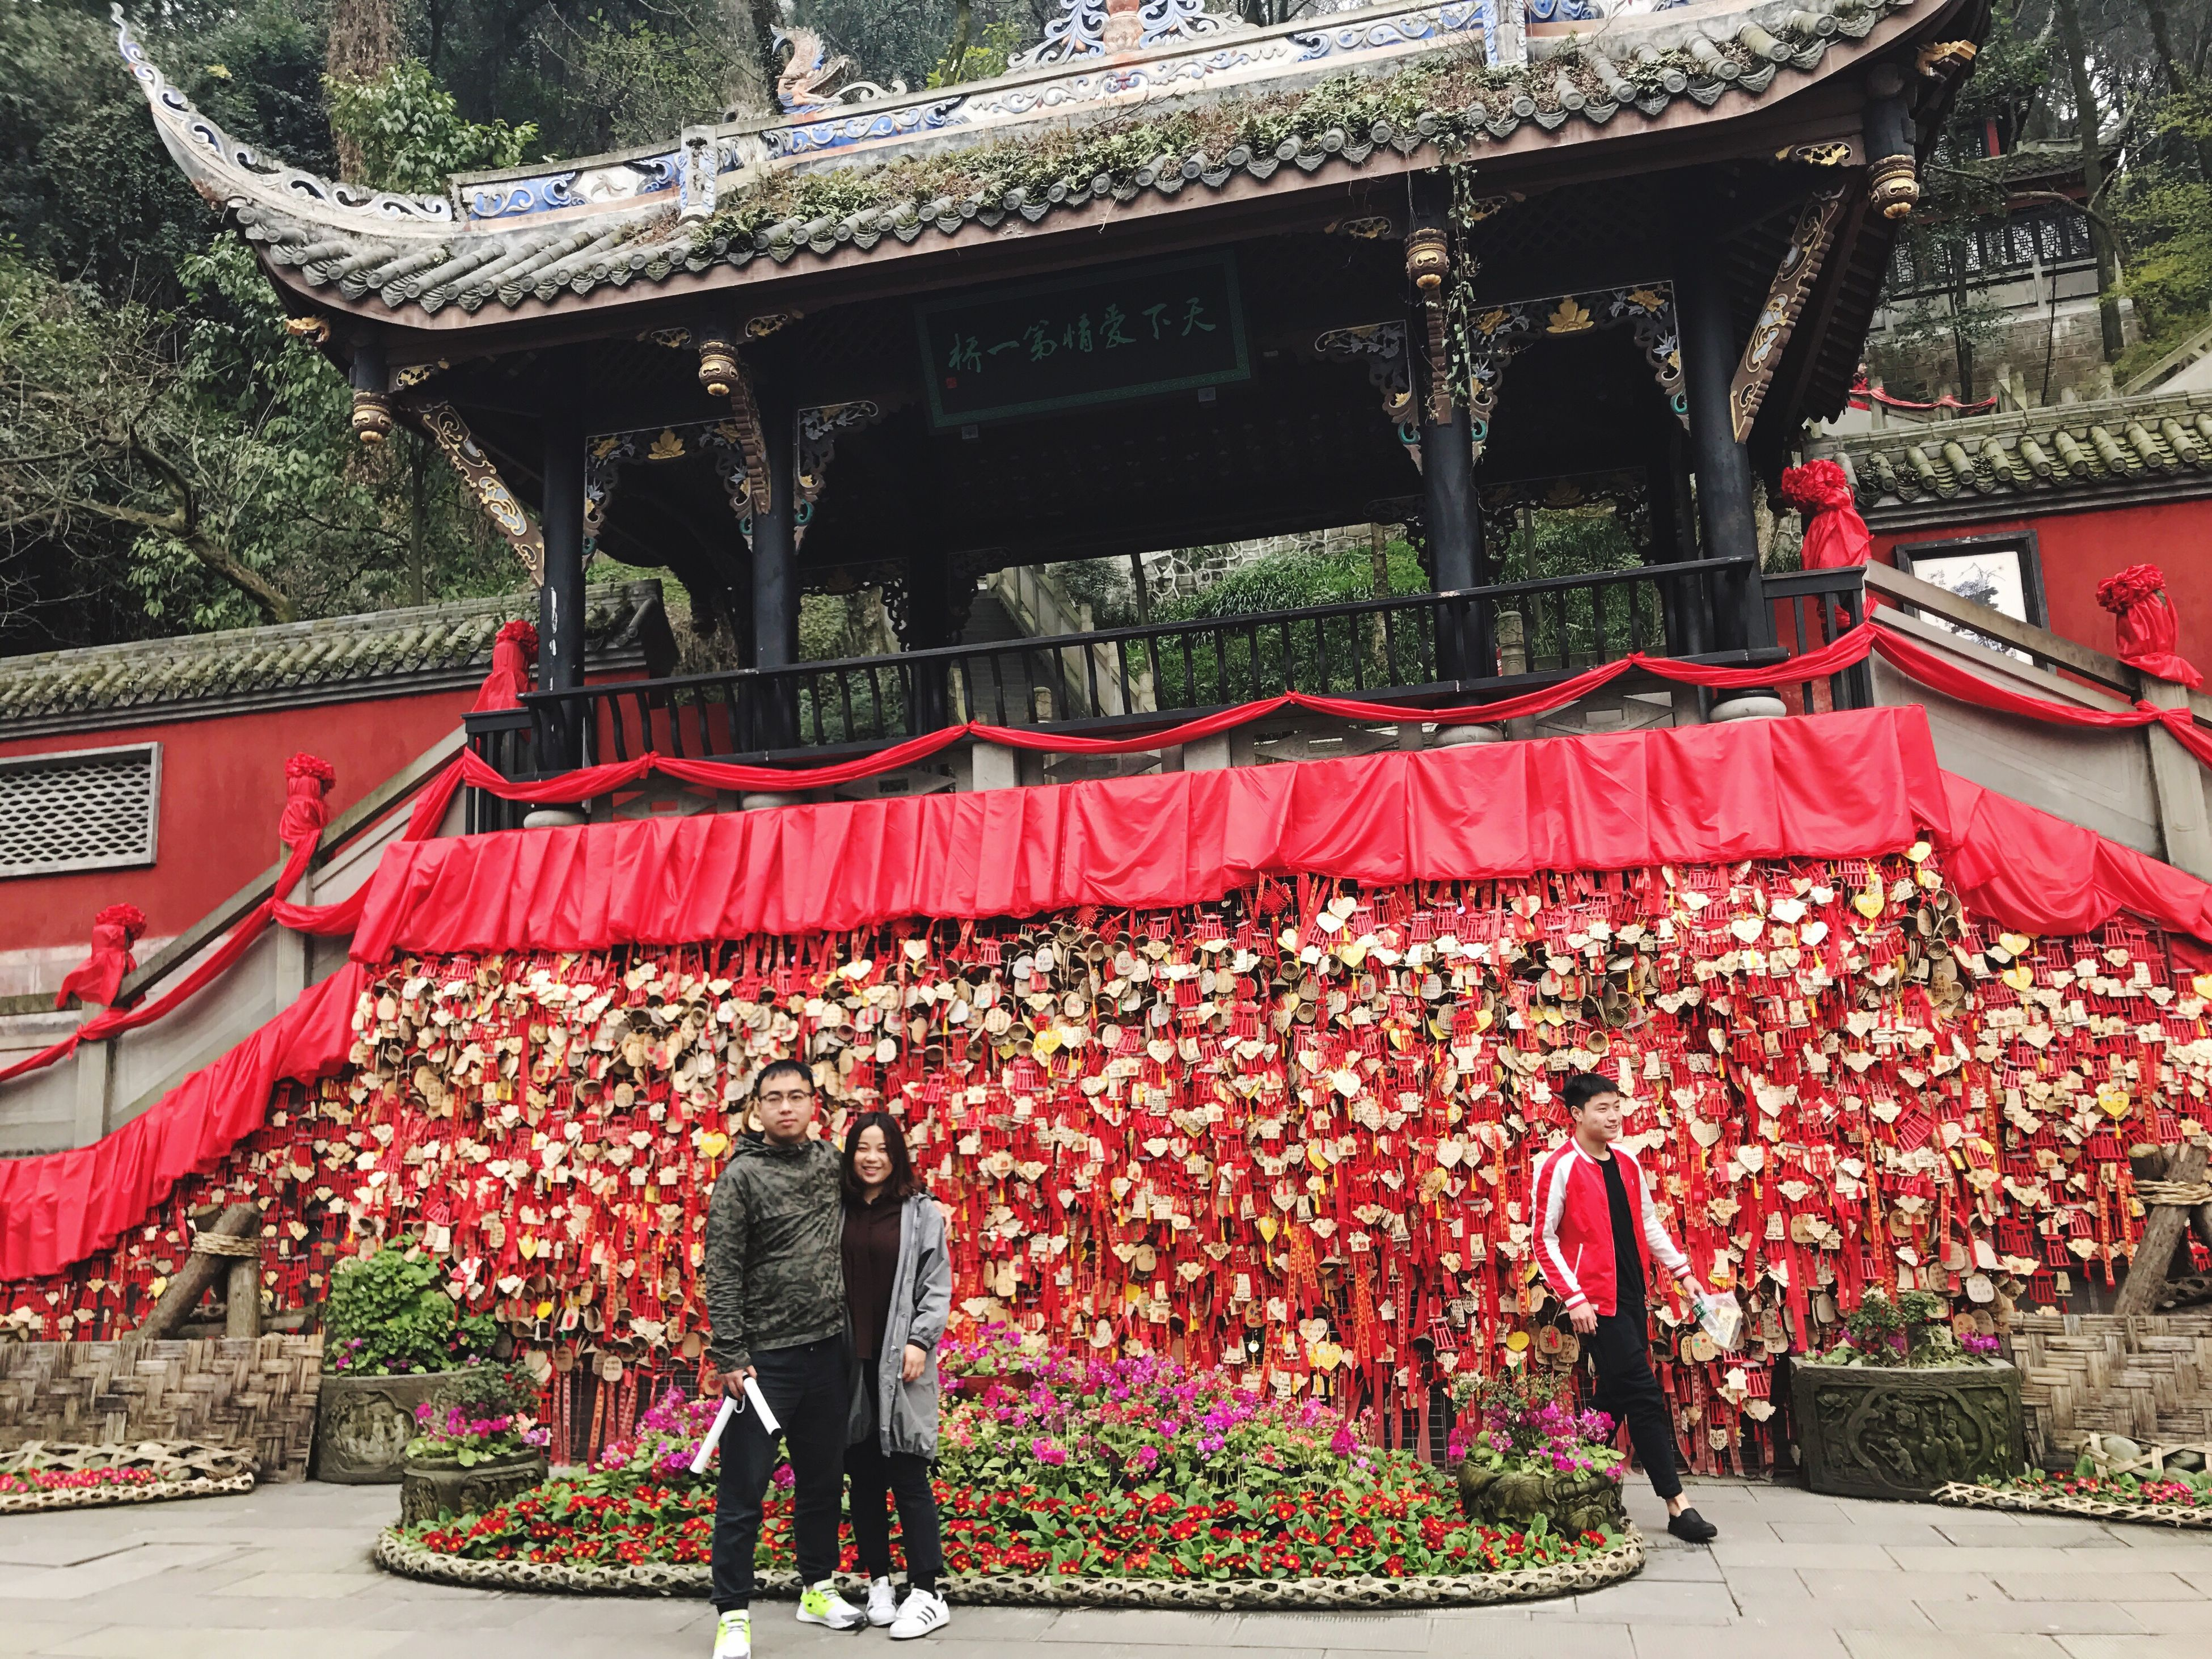 hanging, celebration, illuminated, outdoors, chinese lantern festival, no people, architecture, performing arts event, auditorium, day